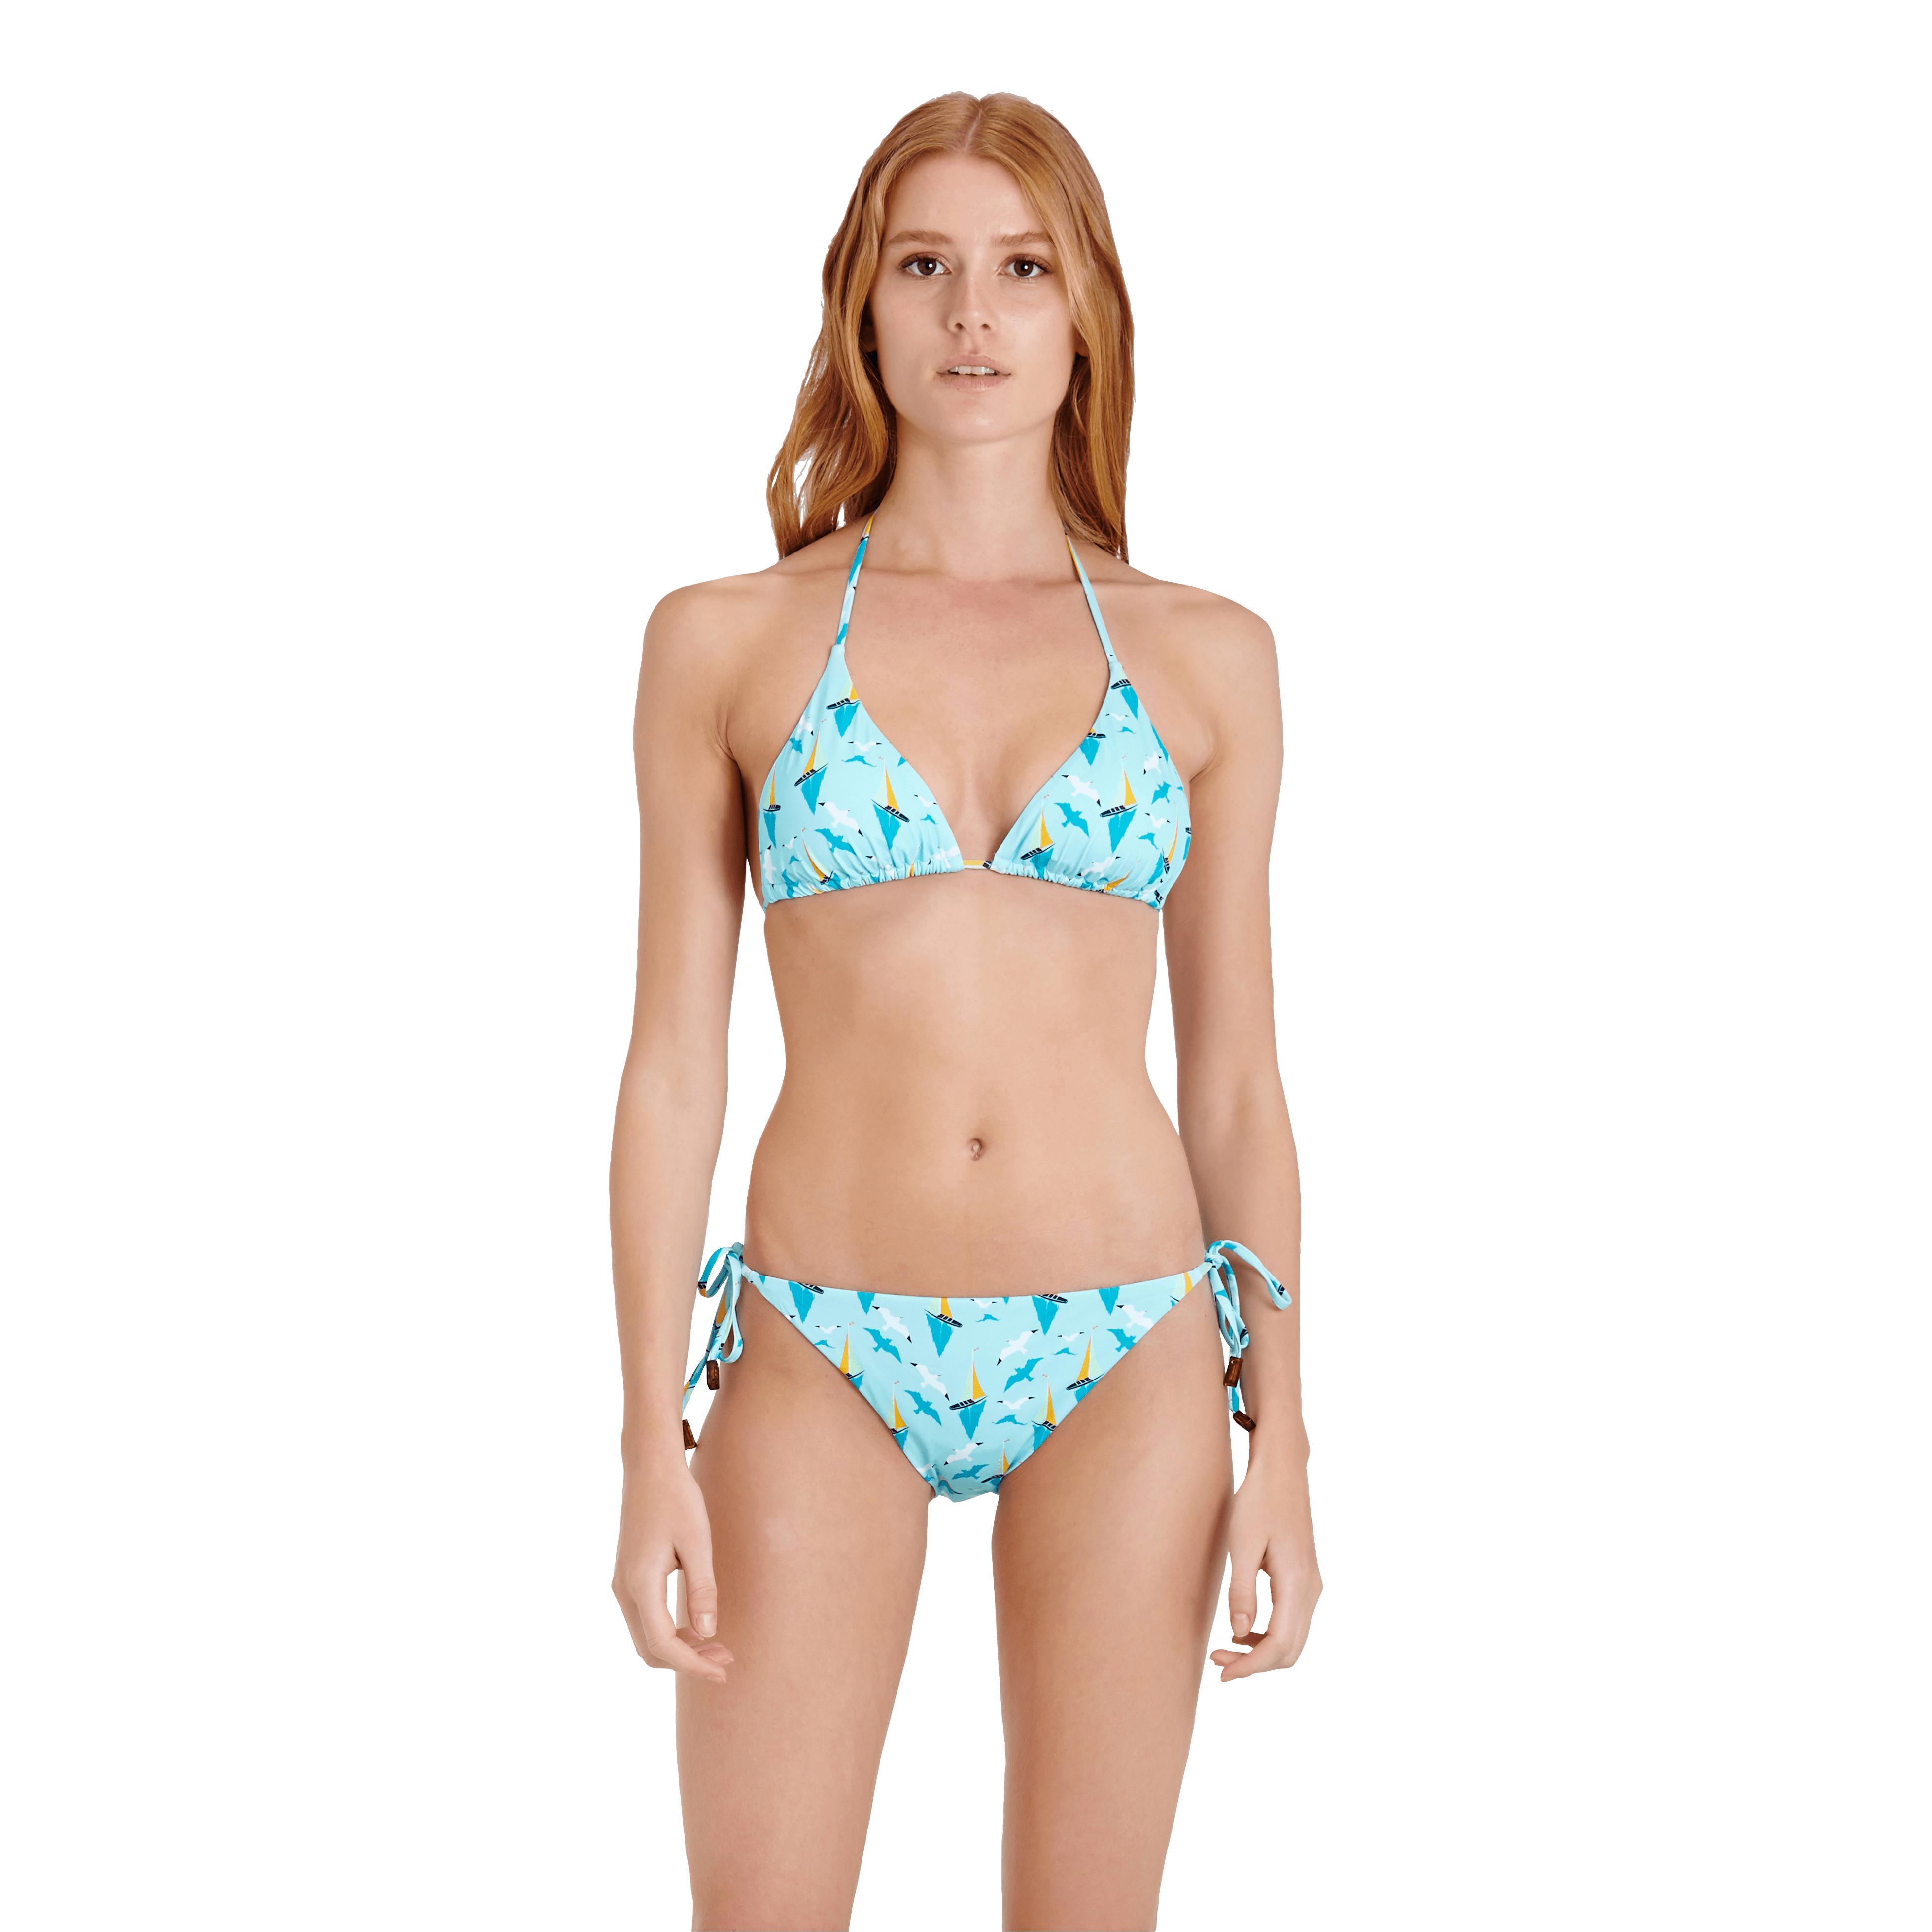 vilebrequin synthetic women triangle bikini top bateaux sur l 39 eau in blue lyst